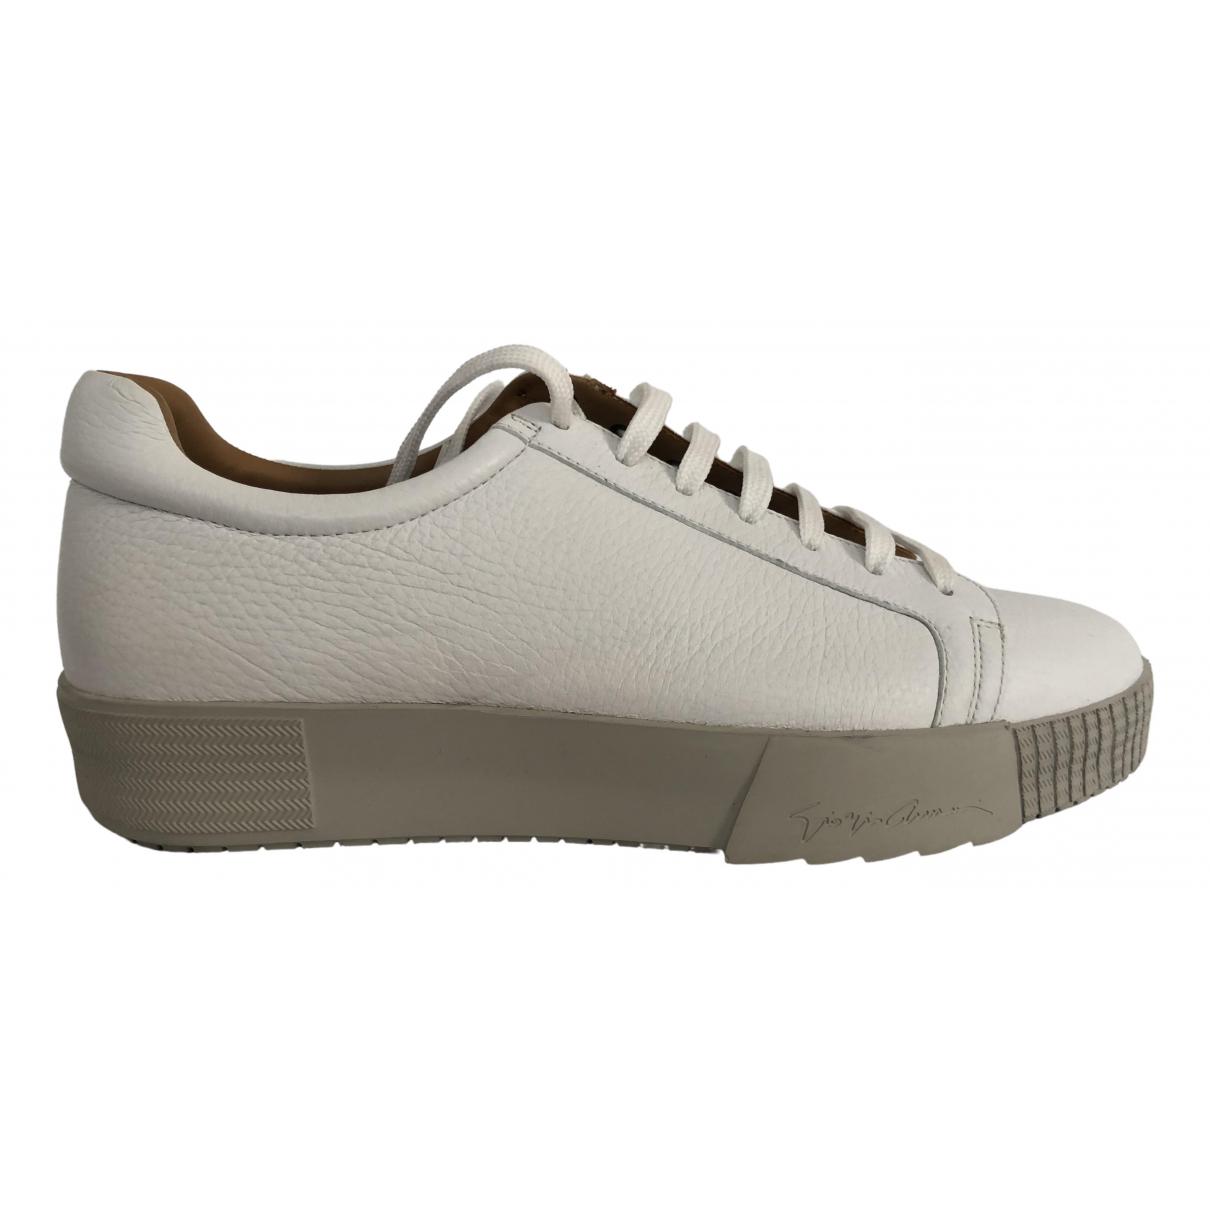 Giorgio Armani \N Sneakers in  Weiss Leder